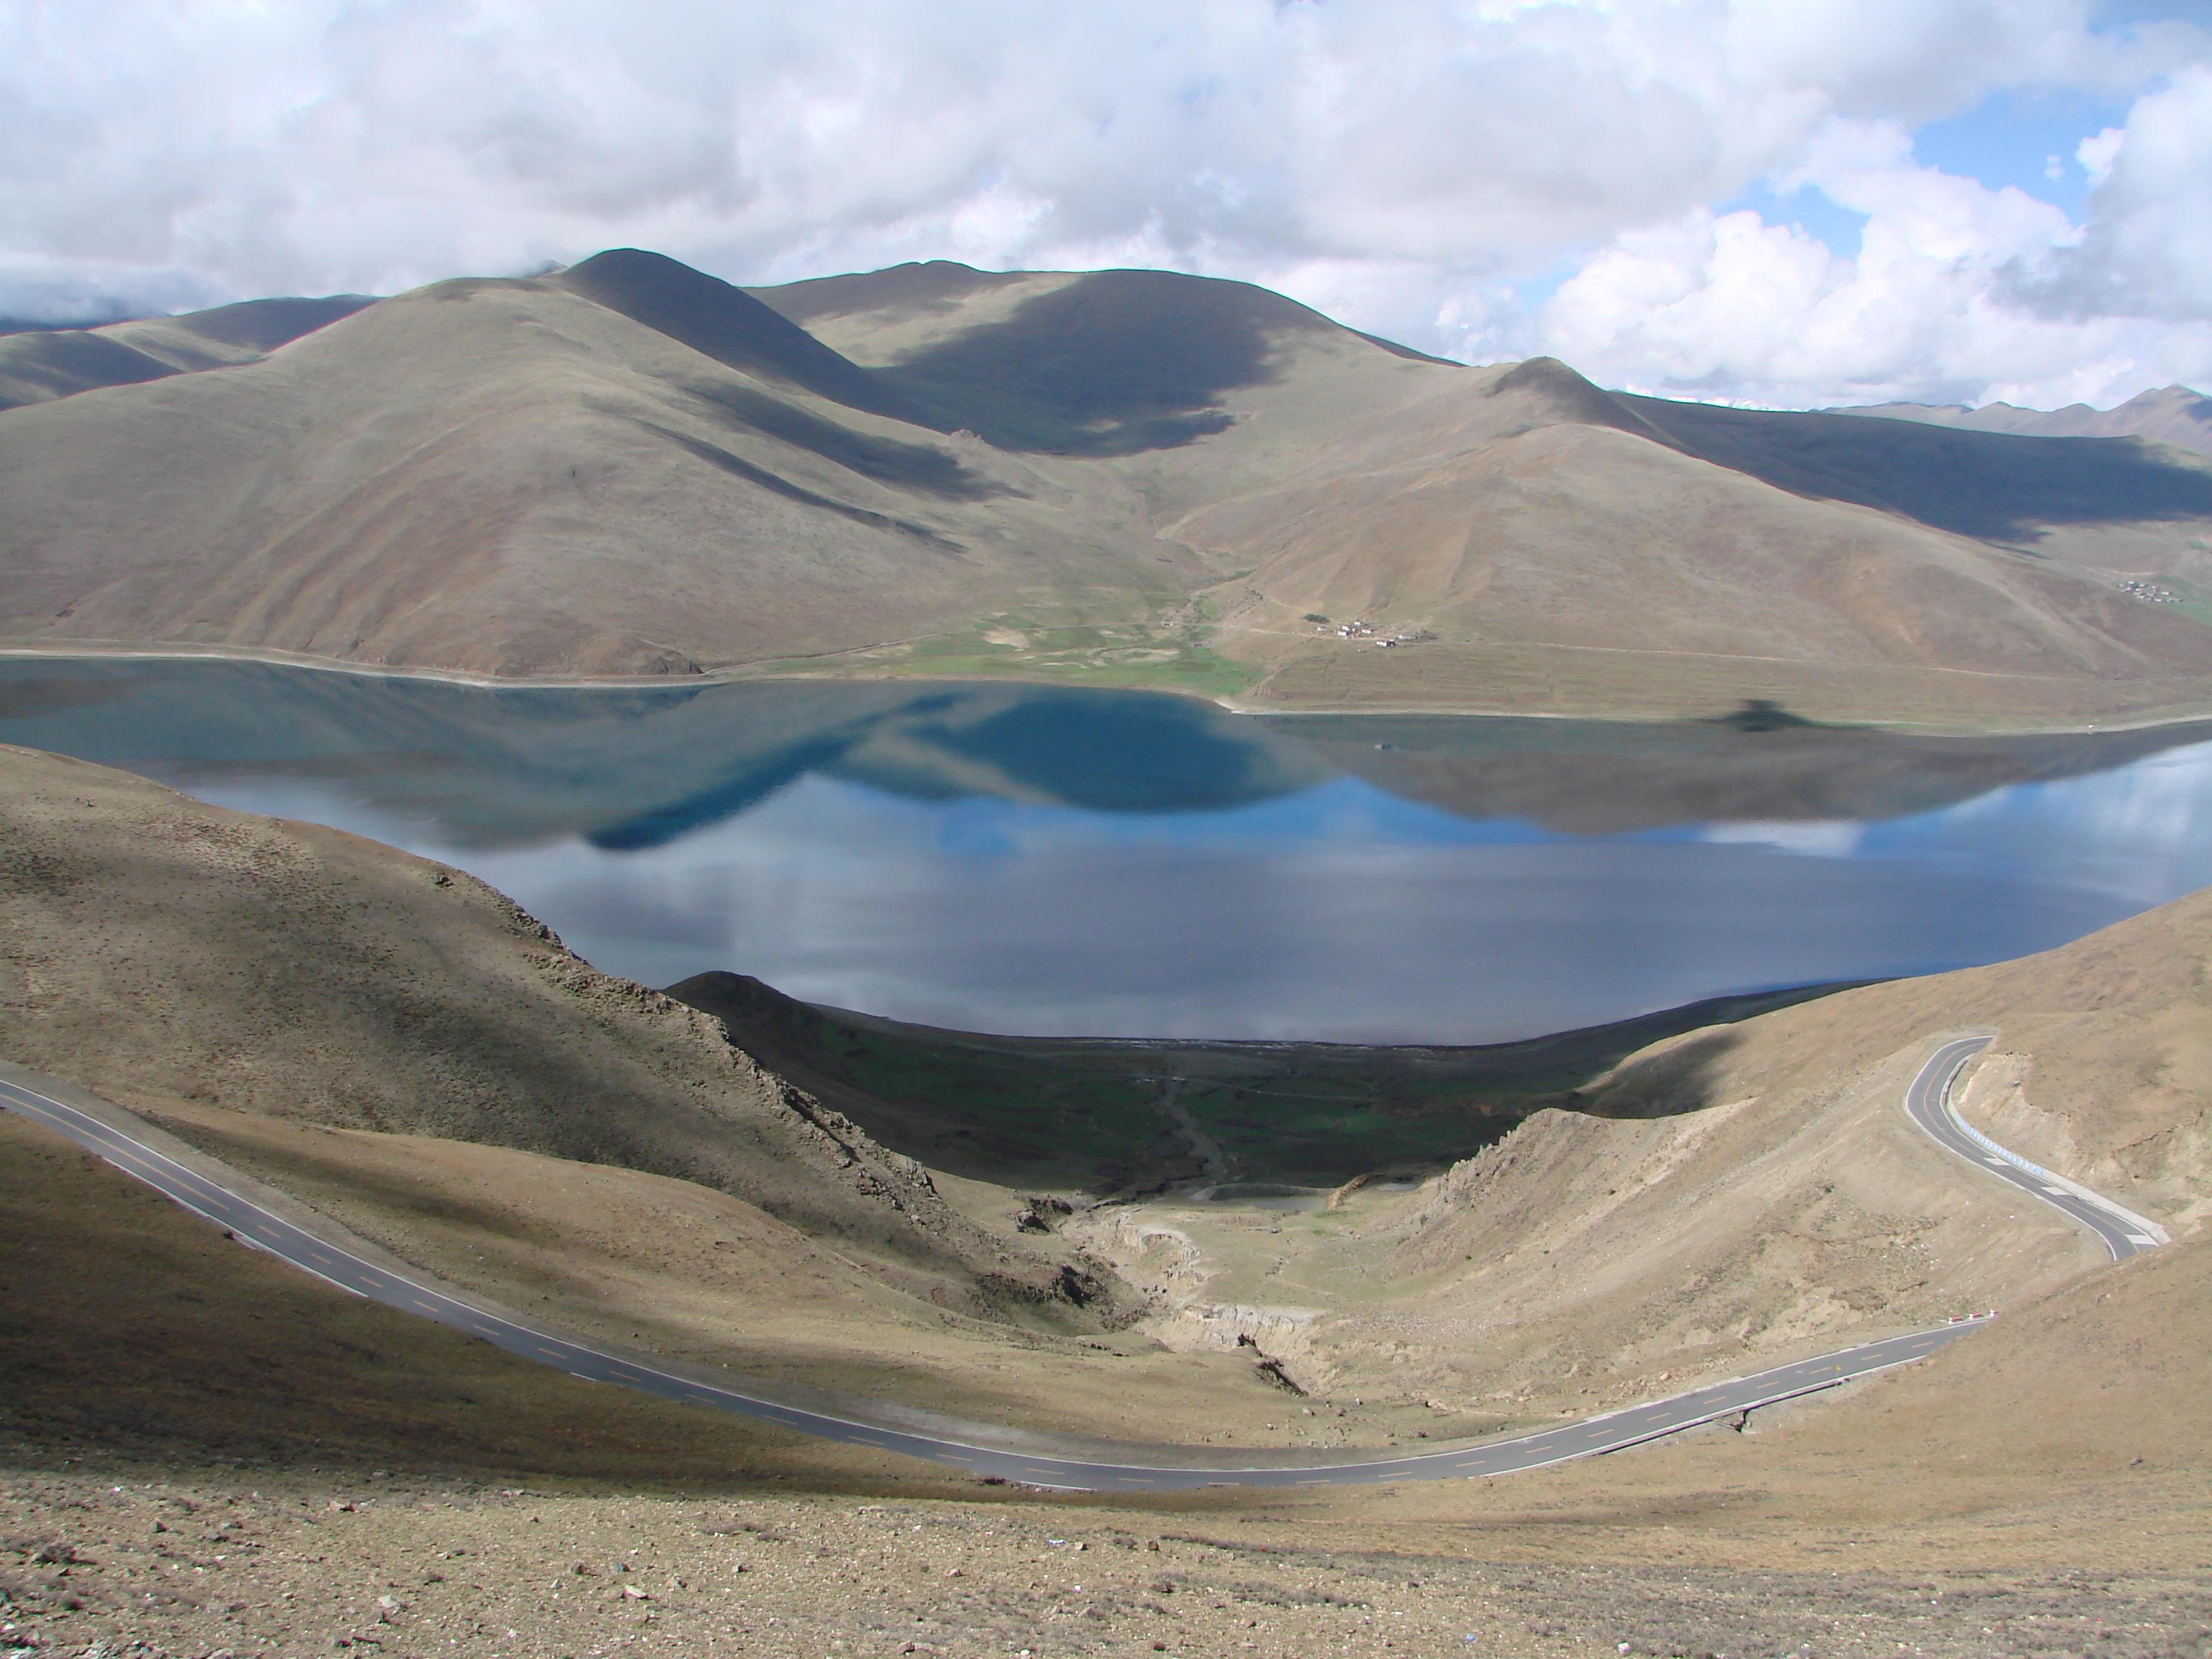 Tibet - DSC06589.JPG